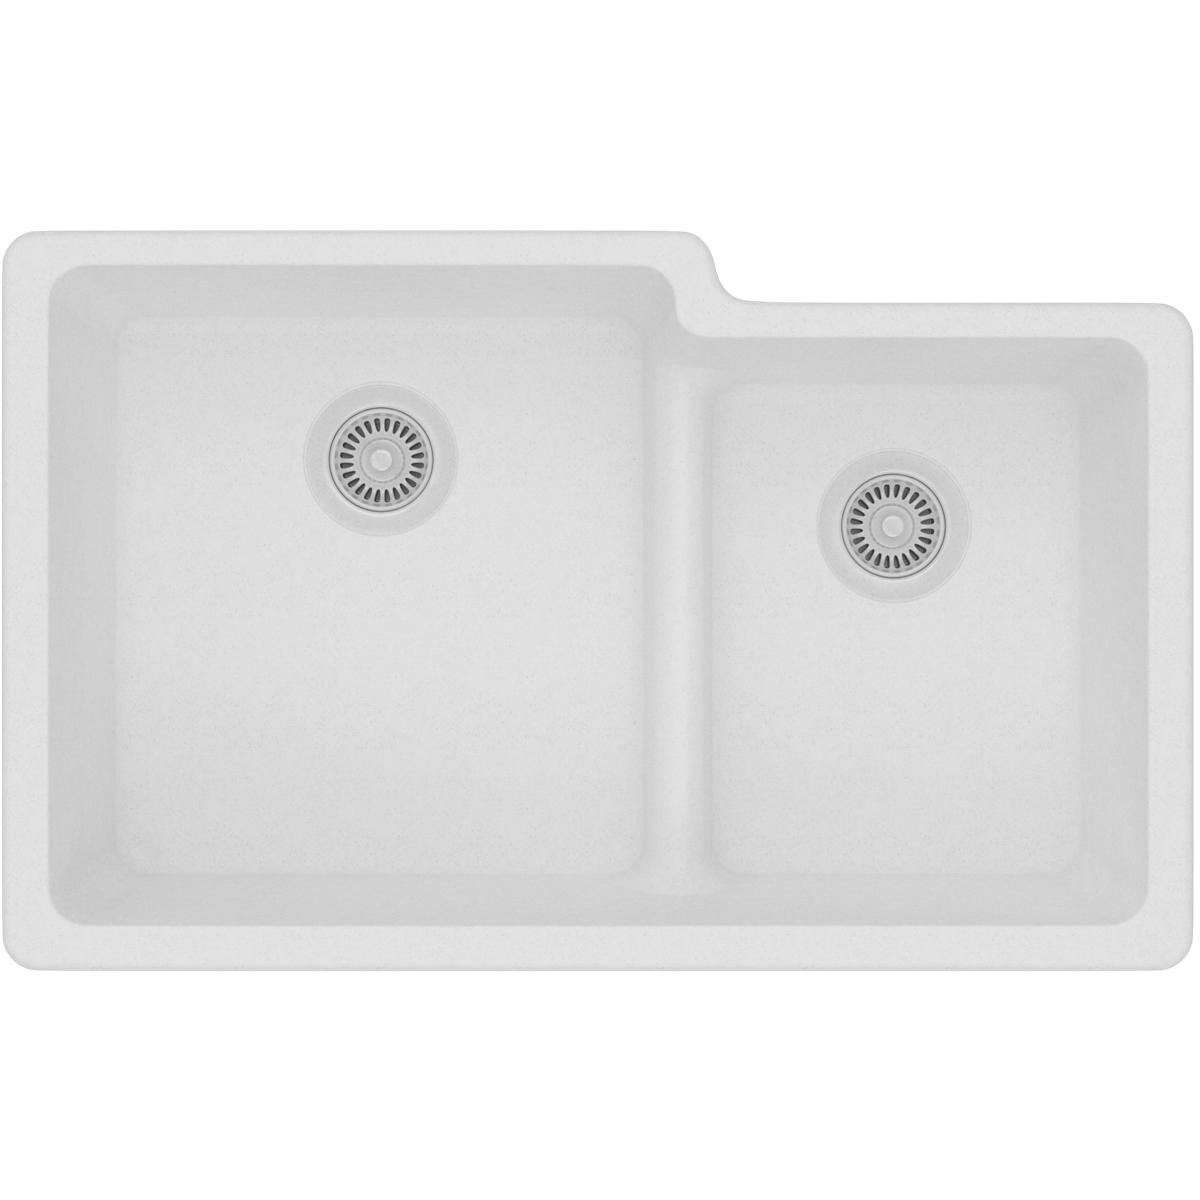 Elkay Quartz Classic ELGULBO3322WH0 White Offset 60/40 Double Bowl Undermount Sink with Aqua Divide